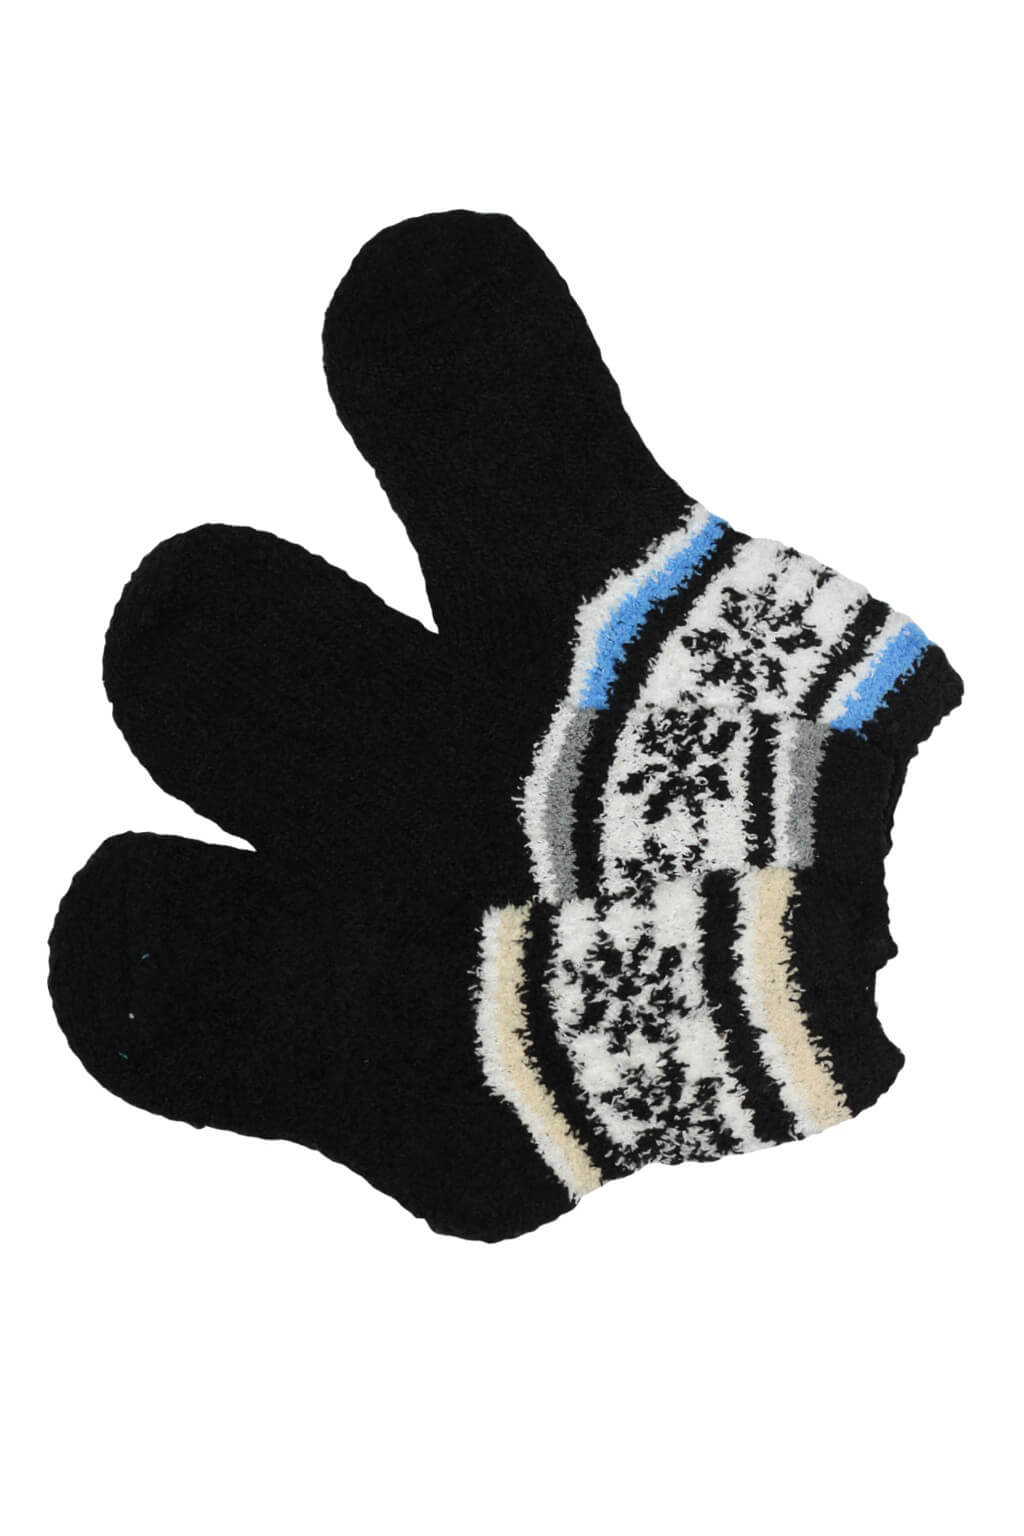 87fe3834e06 Detske chlupate ponozky 3 pary mix 35 38